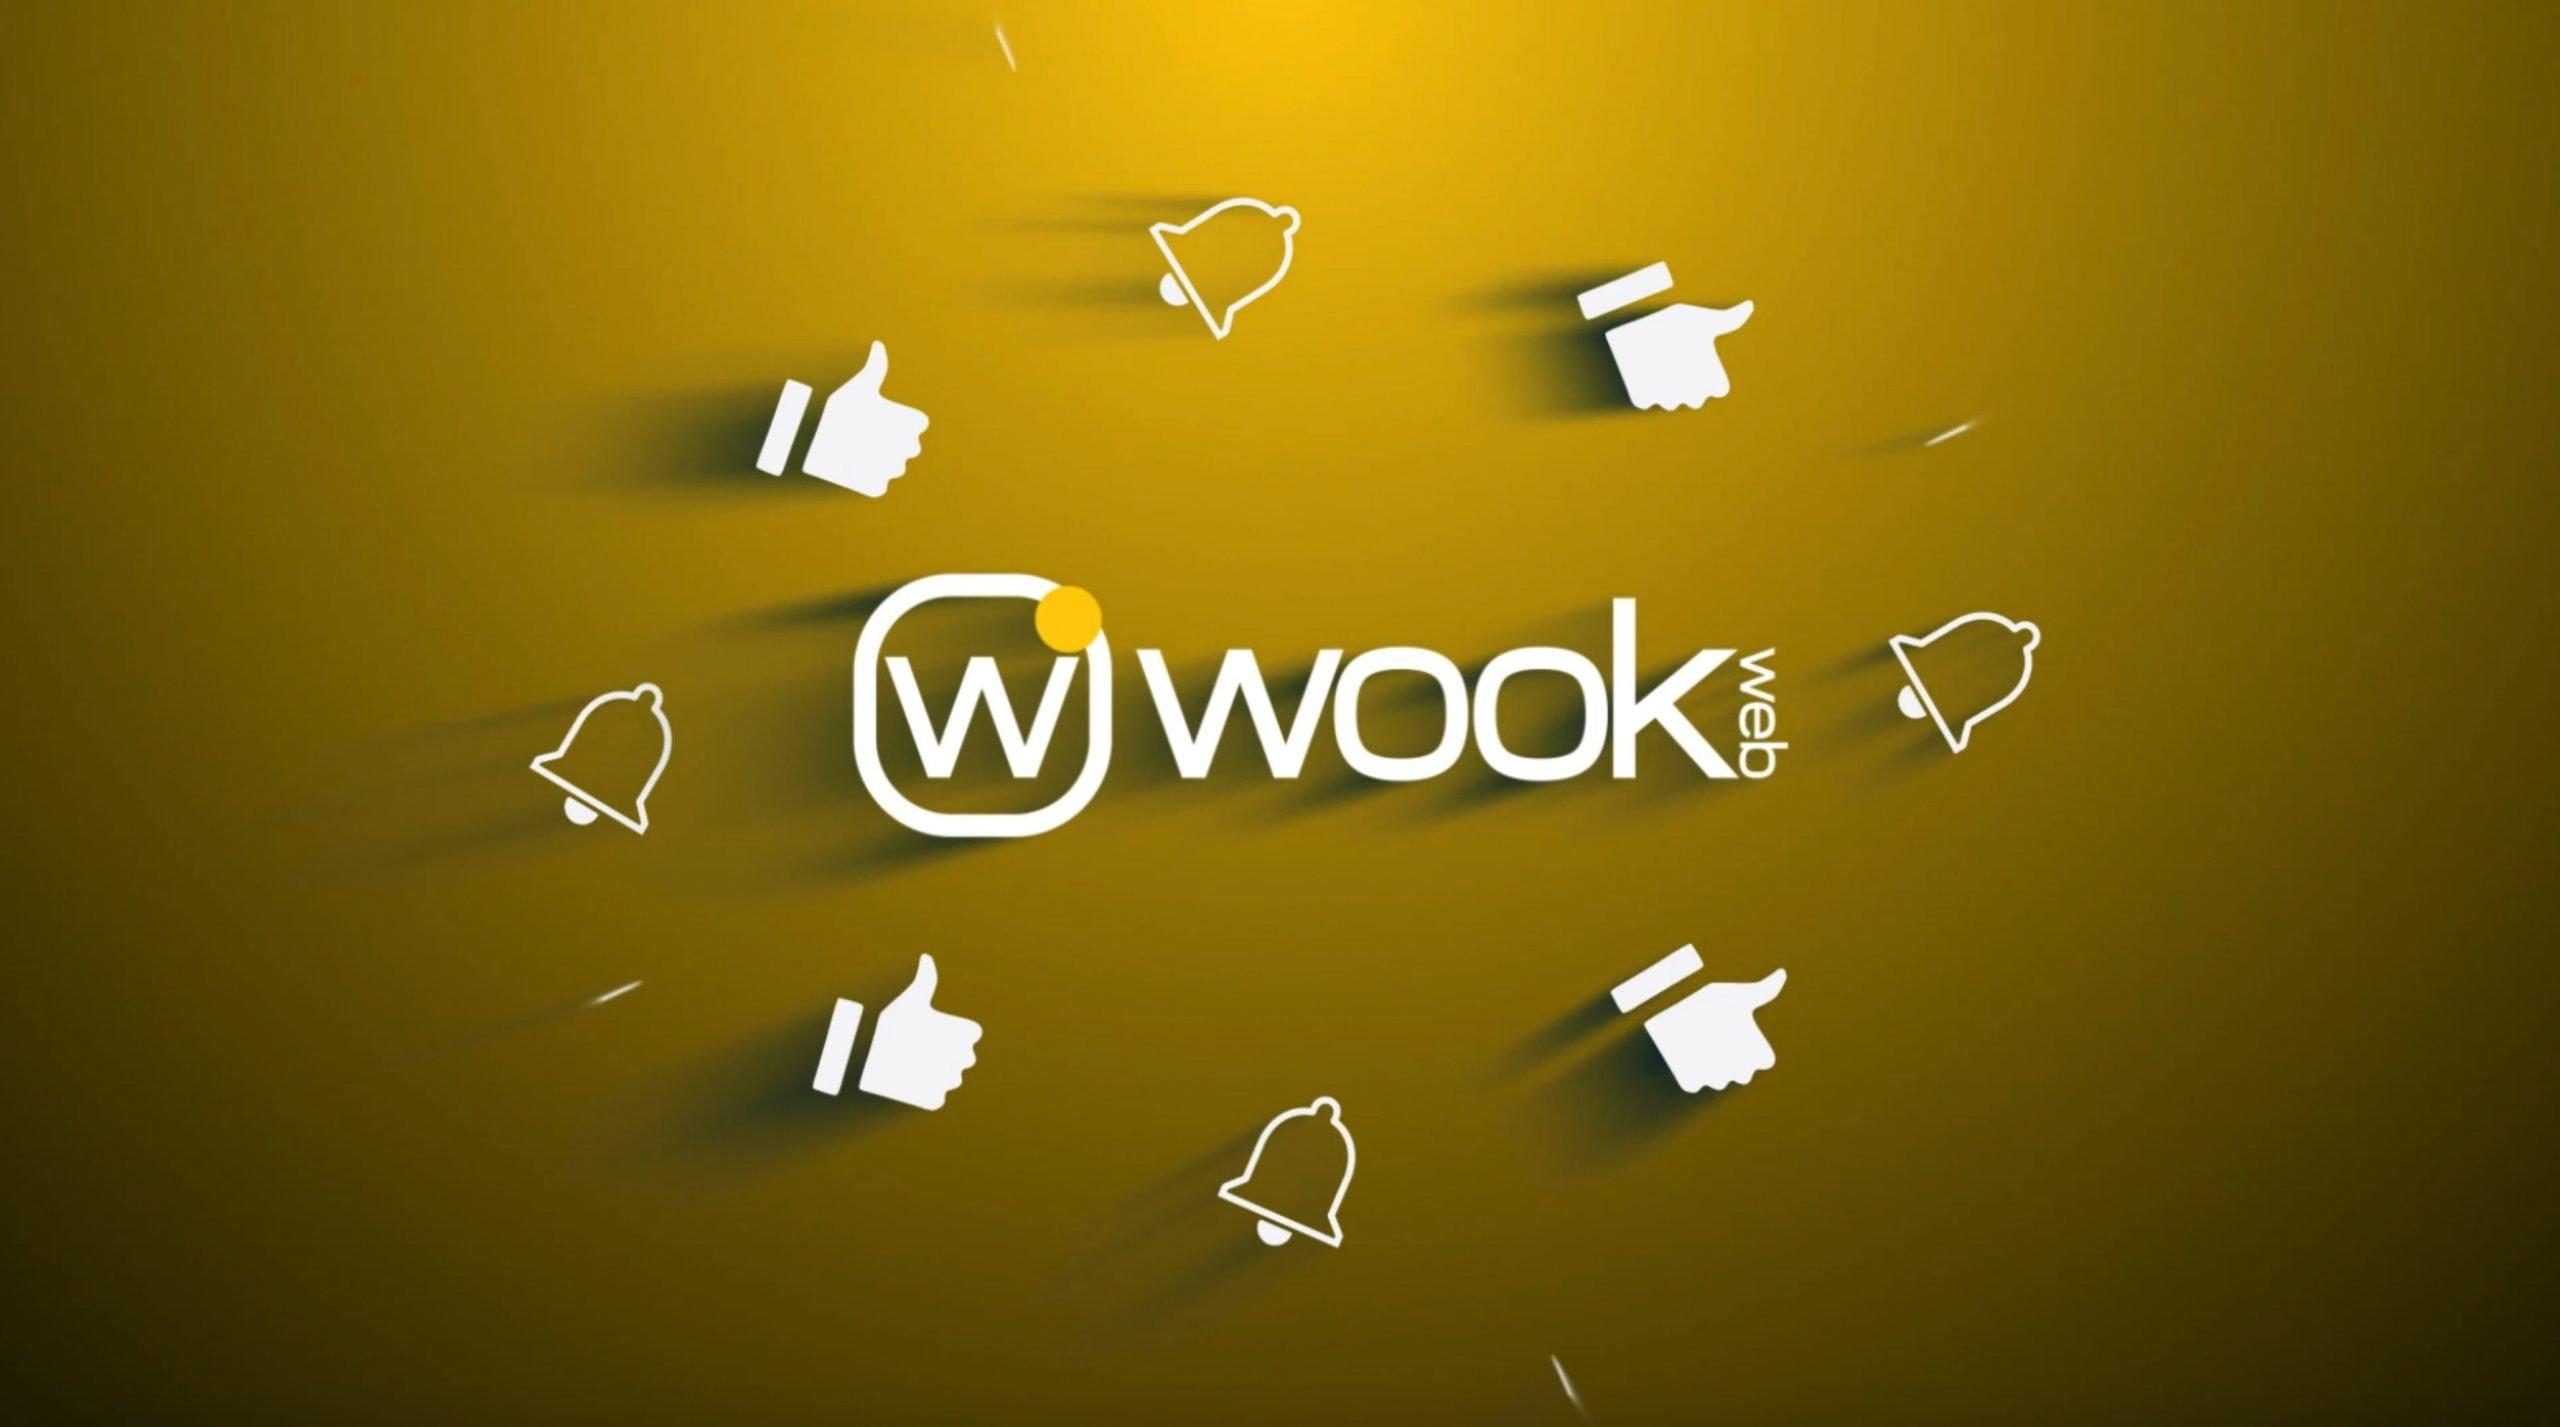 Wookweb artık Youtube'da